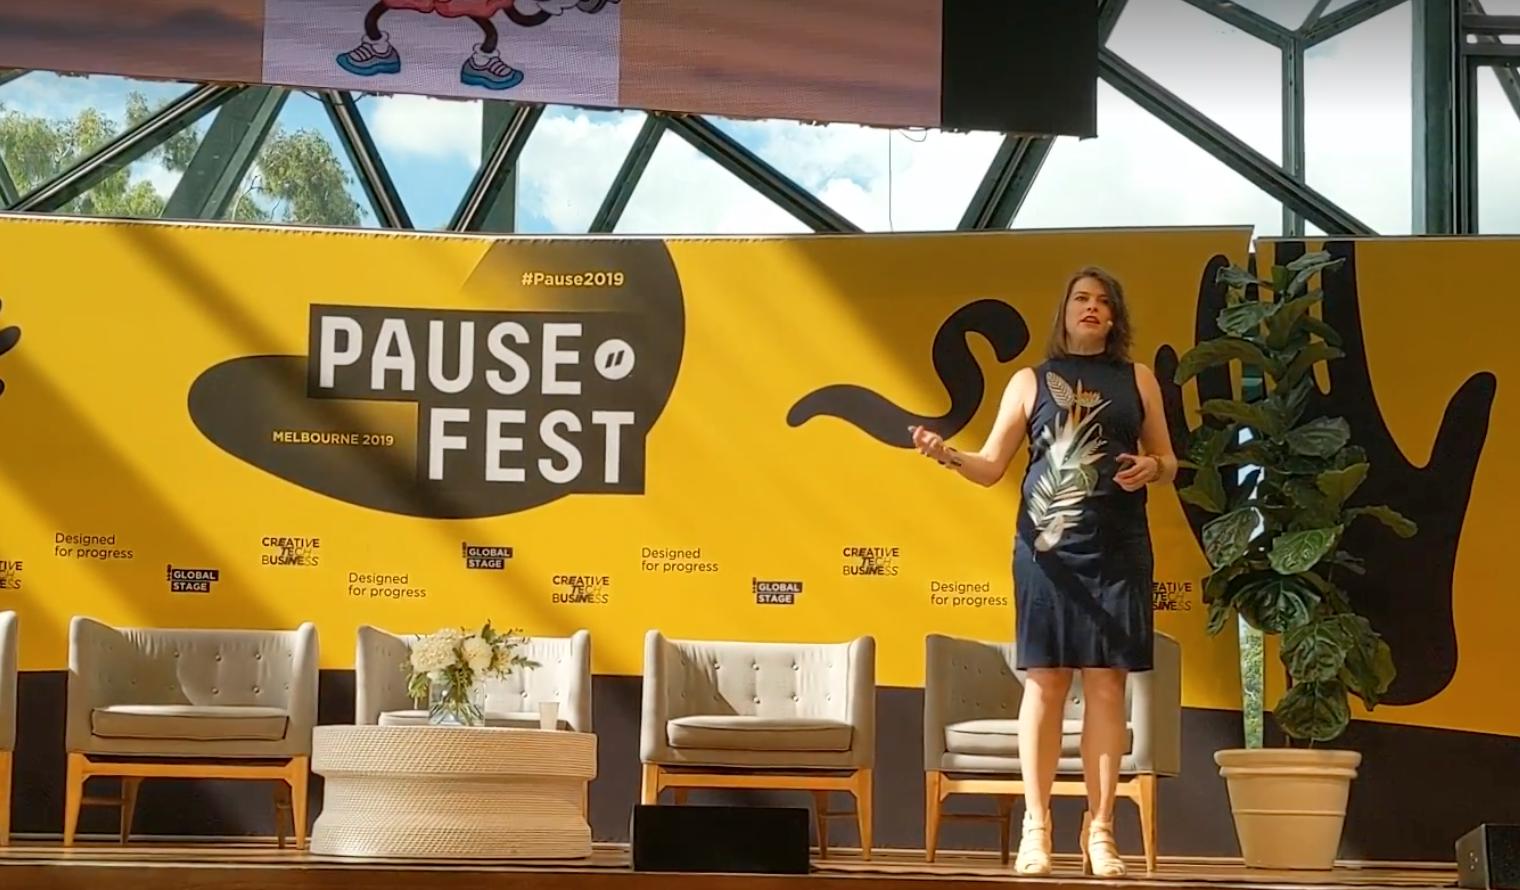 Pausefest Melbourne 2019